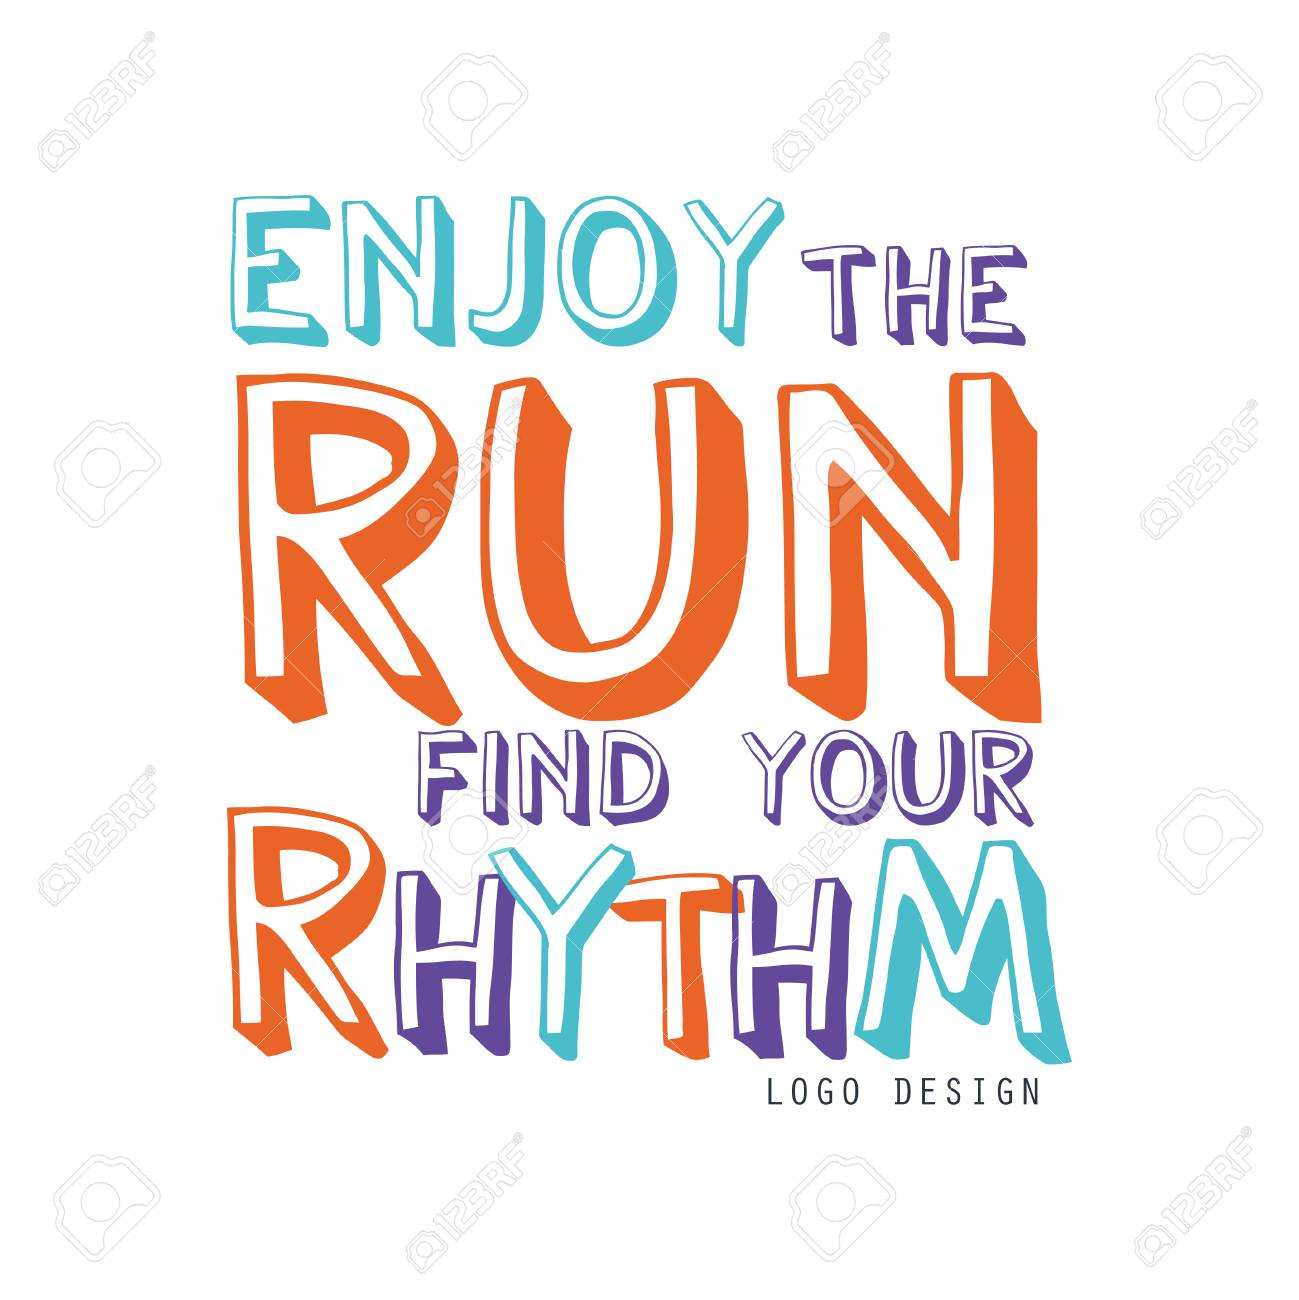 519d46154399 Enjoy the run find your rhythm design, inspirational and motivational..